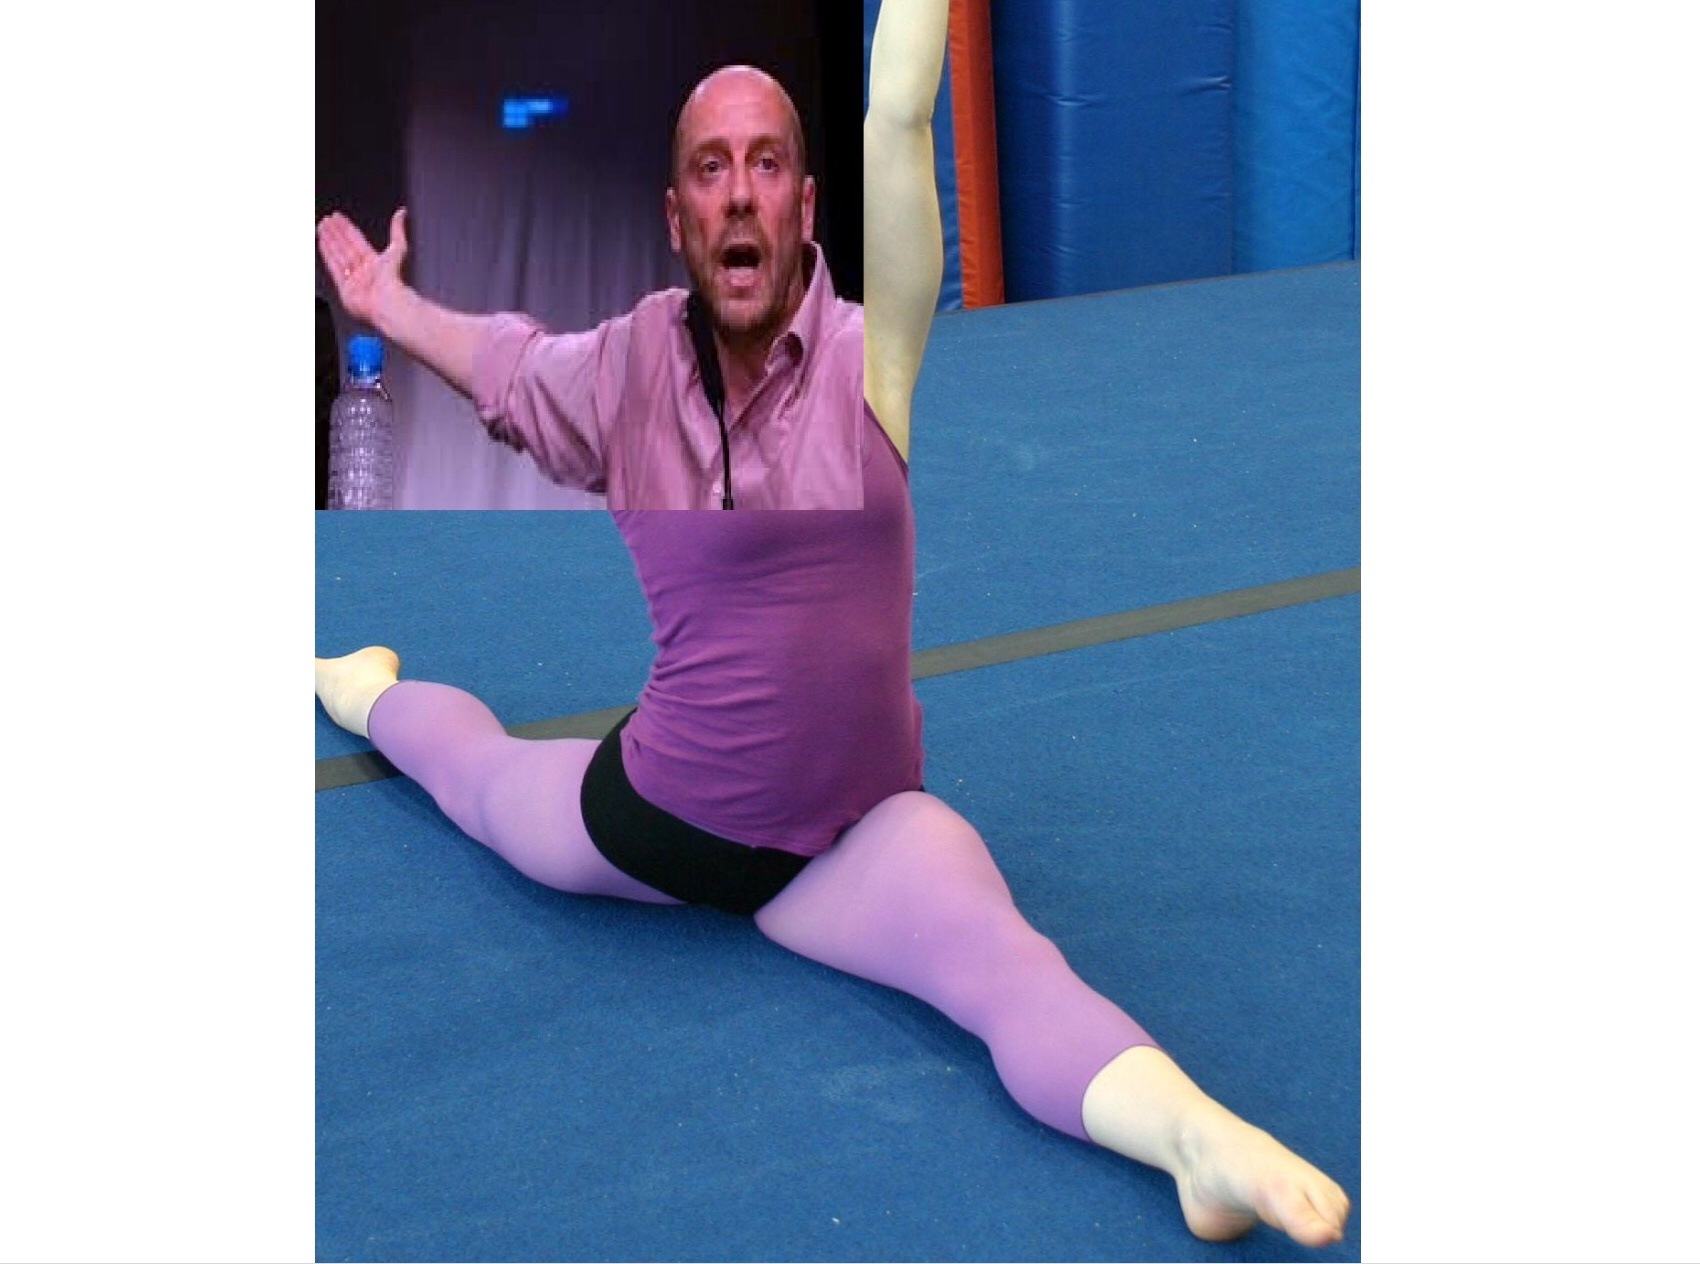 Sticker alain soral danseuse etoile dissident er gay pd homo poupeto